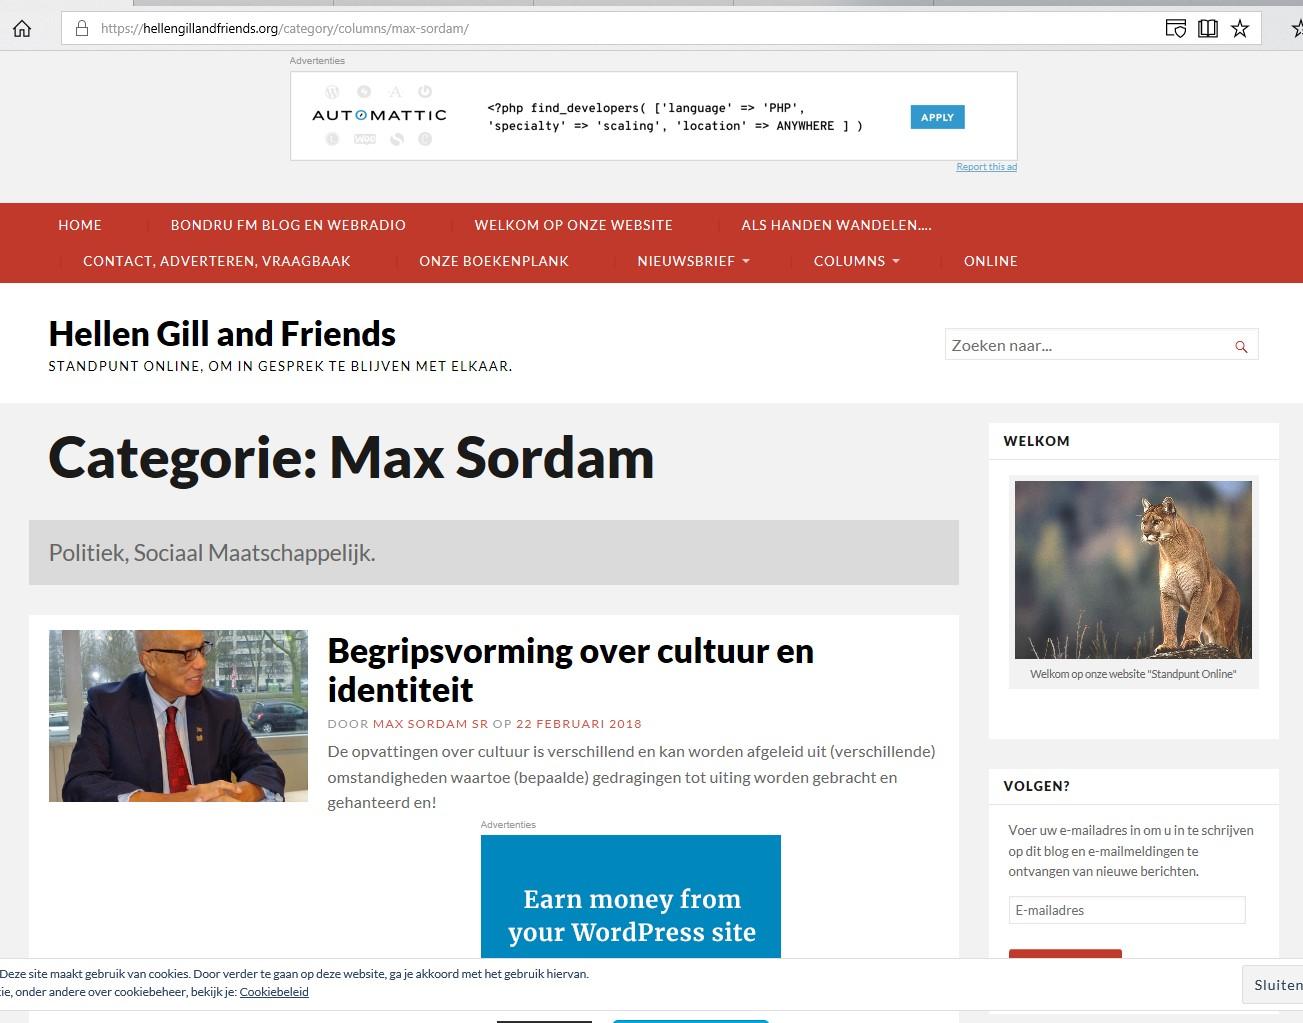 Max Sordam2018 web1